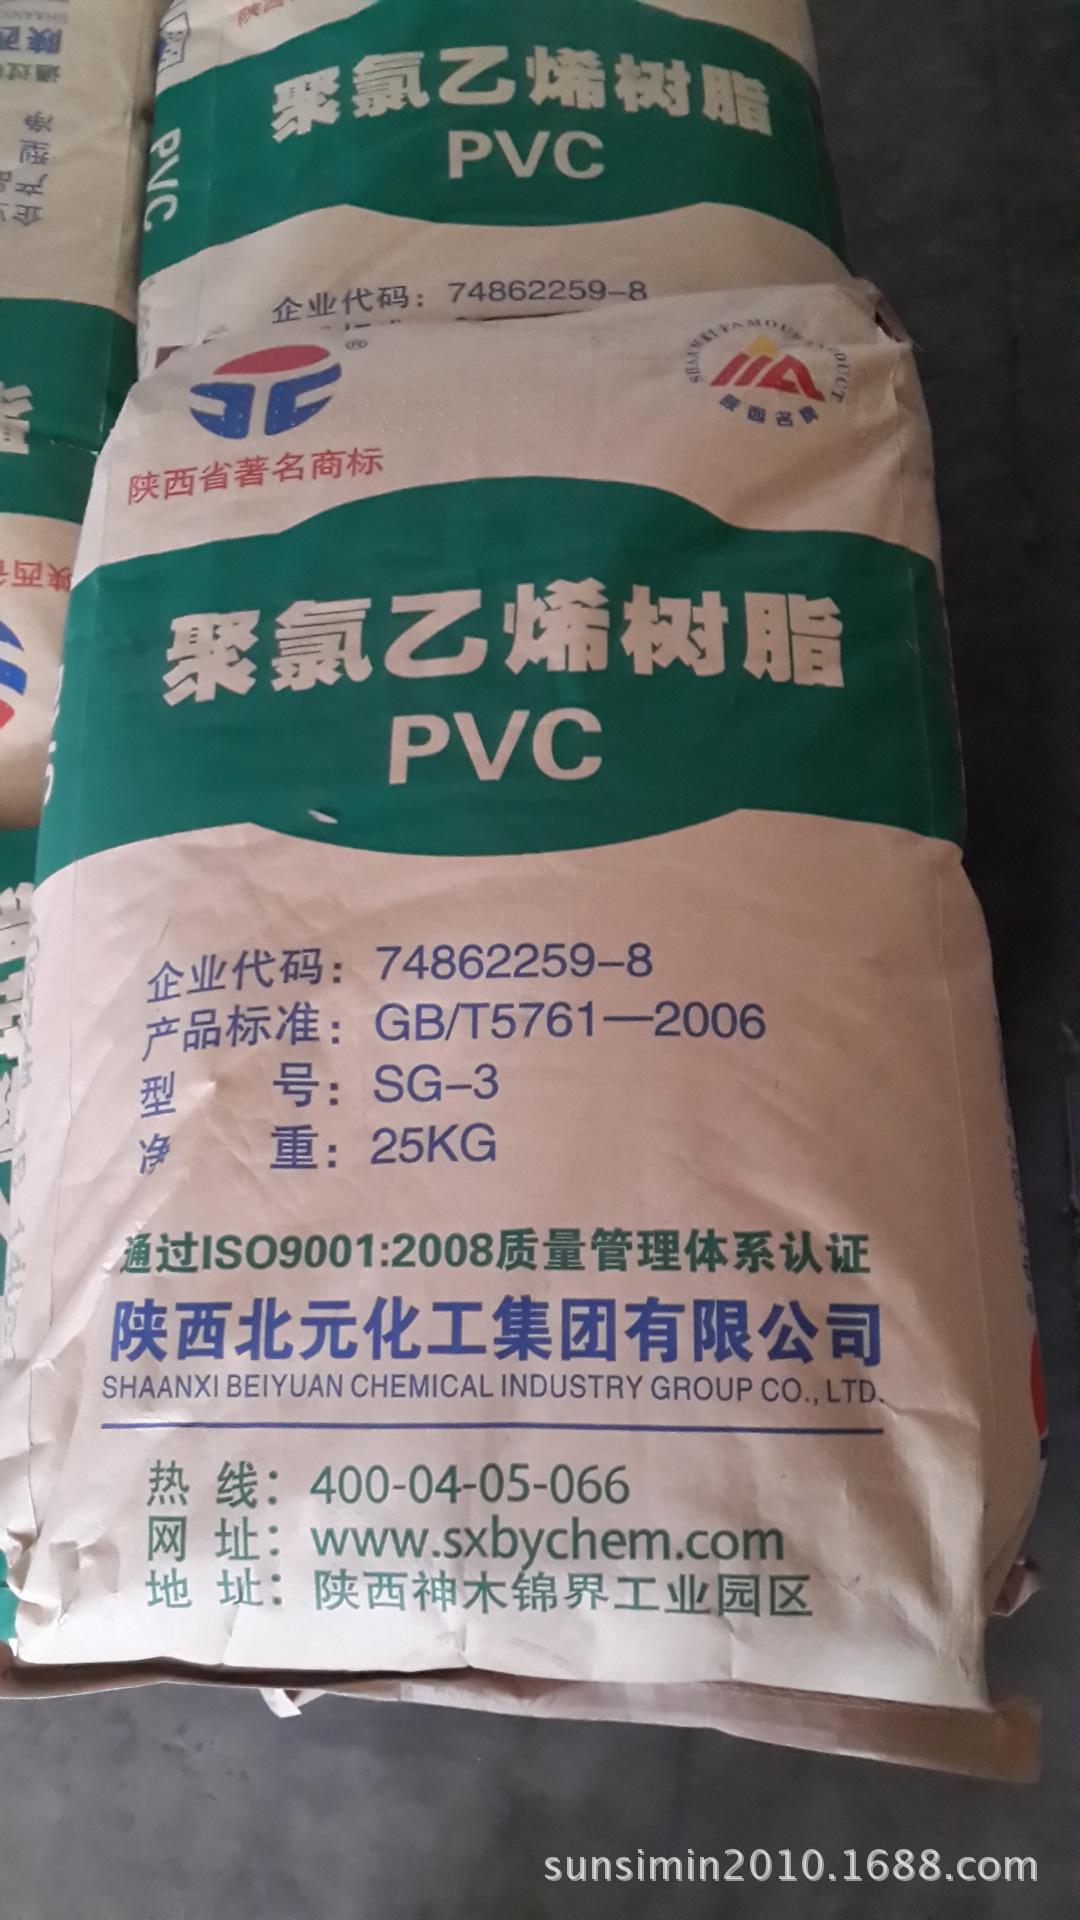 PVC/北元化工/SG3